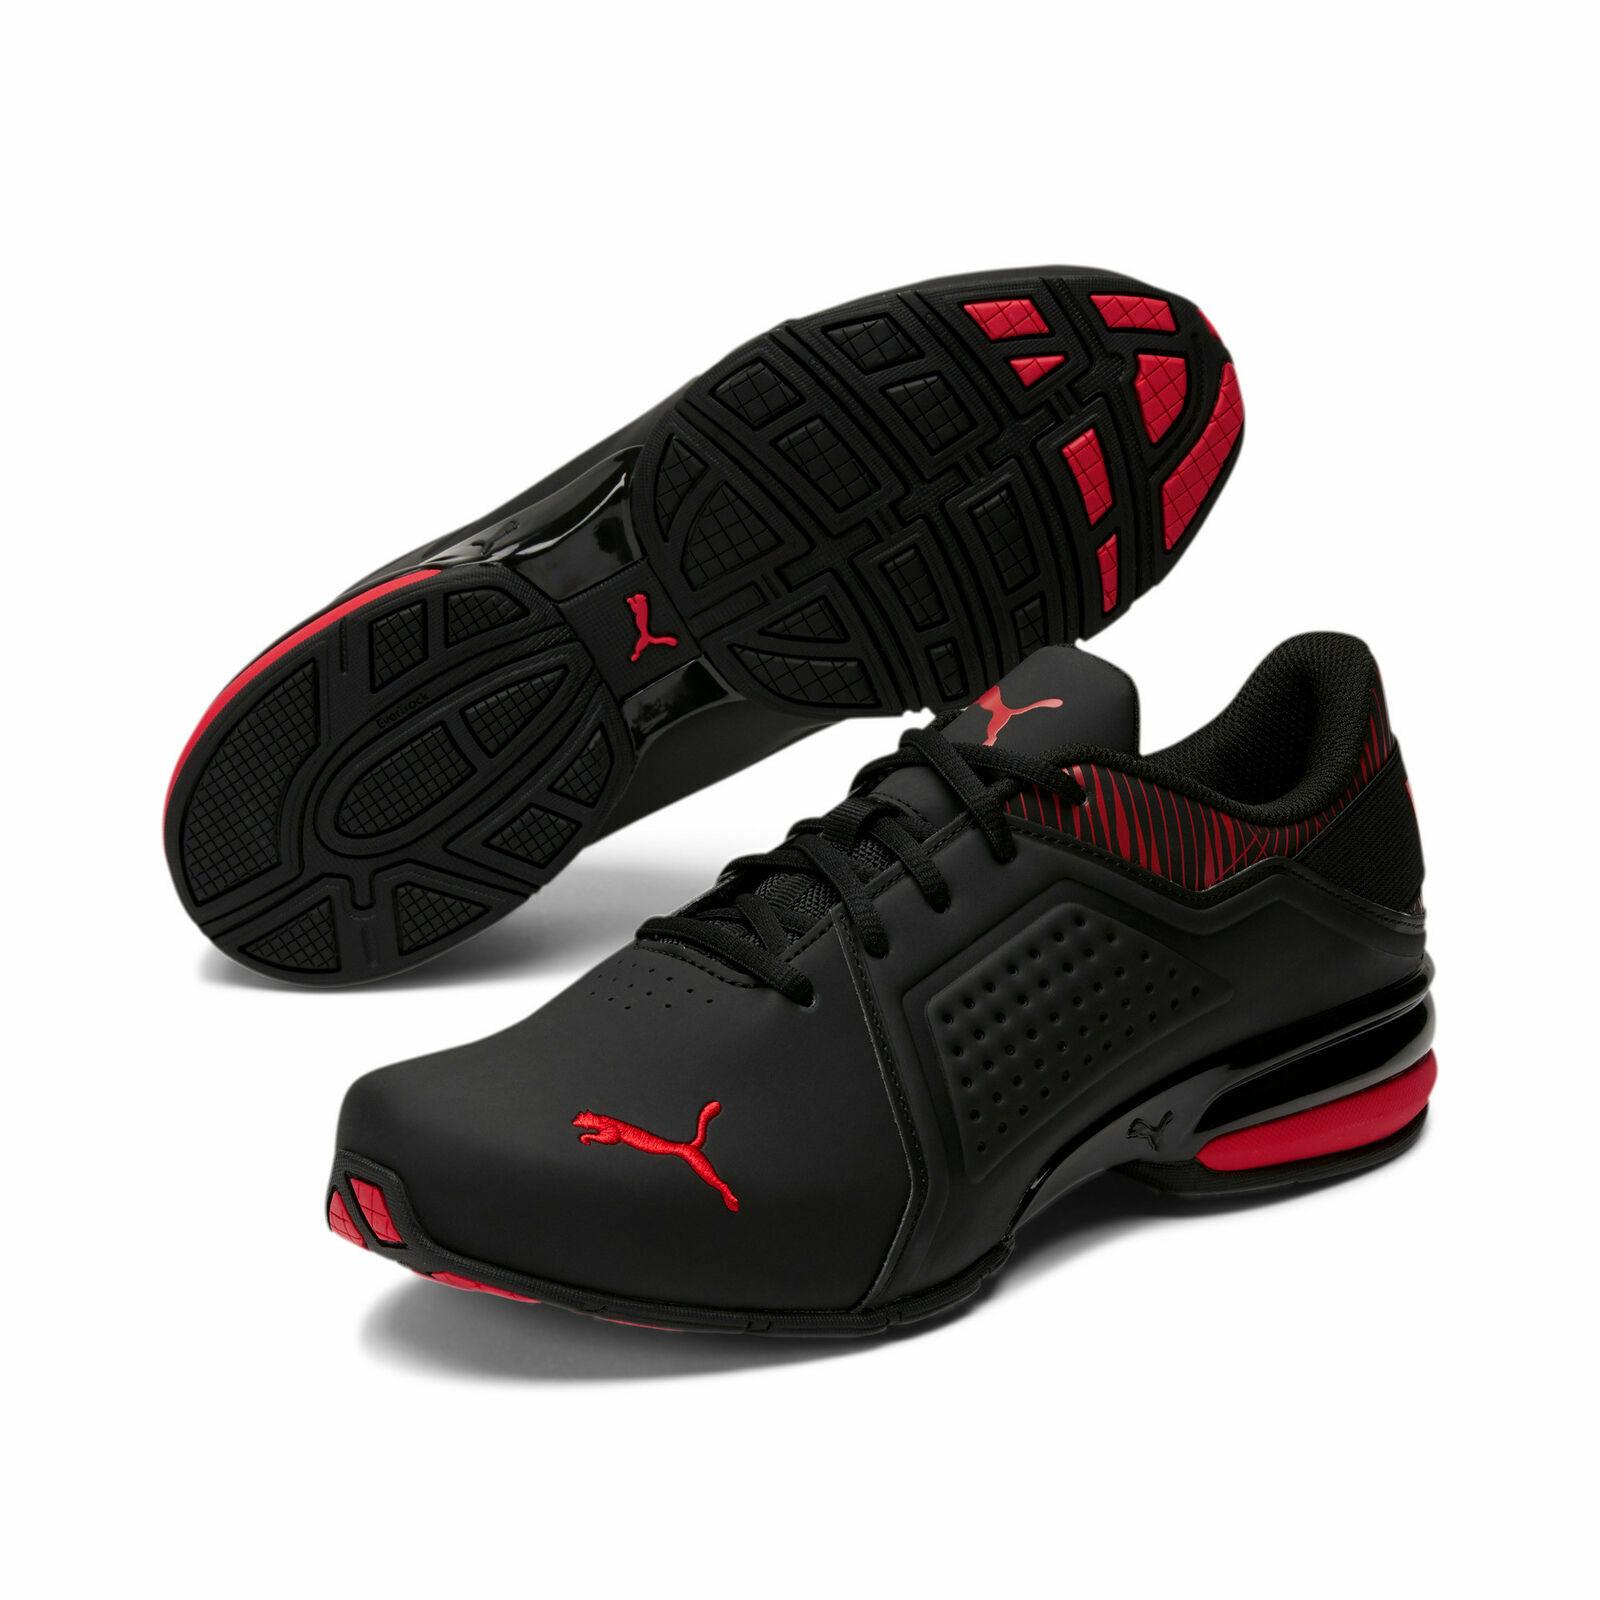 PUMA Men's Viz Runner Graphic Sneakers Size 10.5 Mens